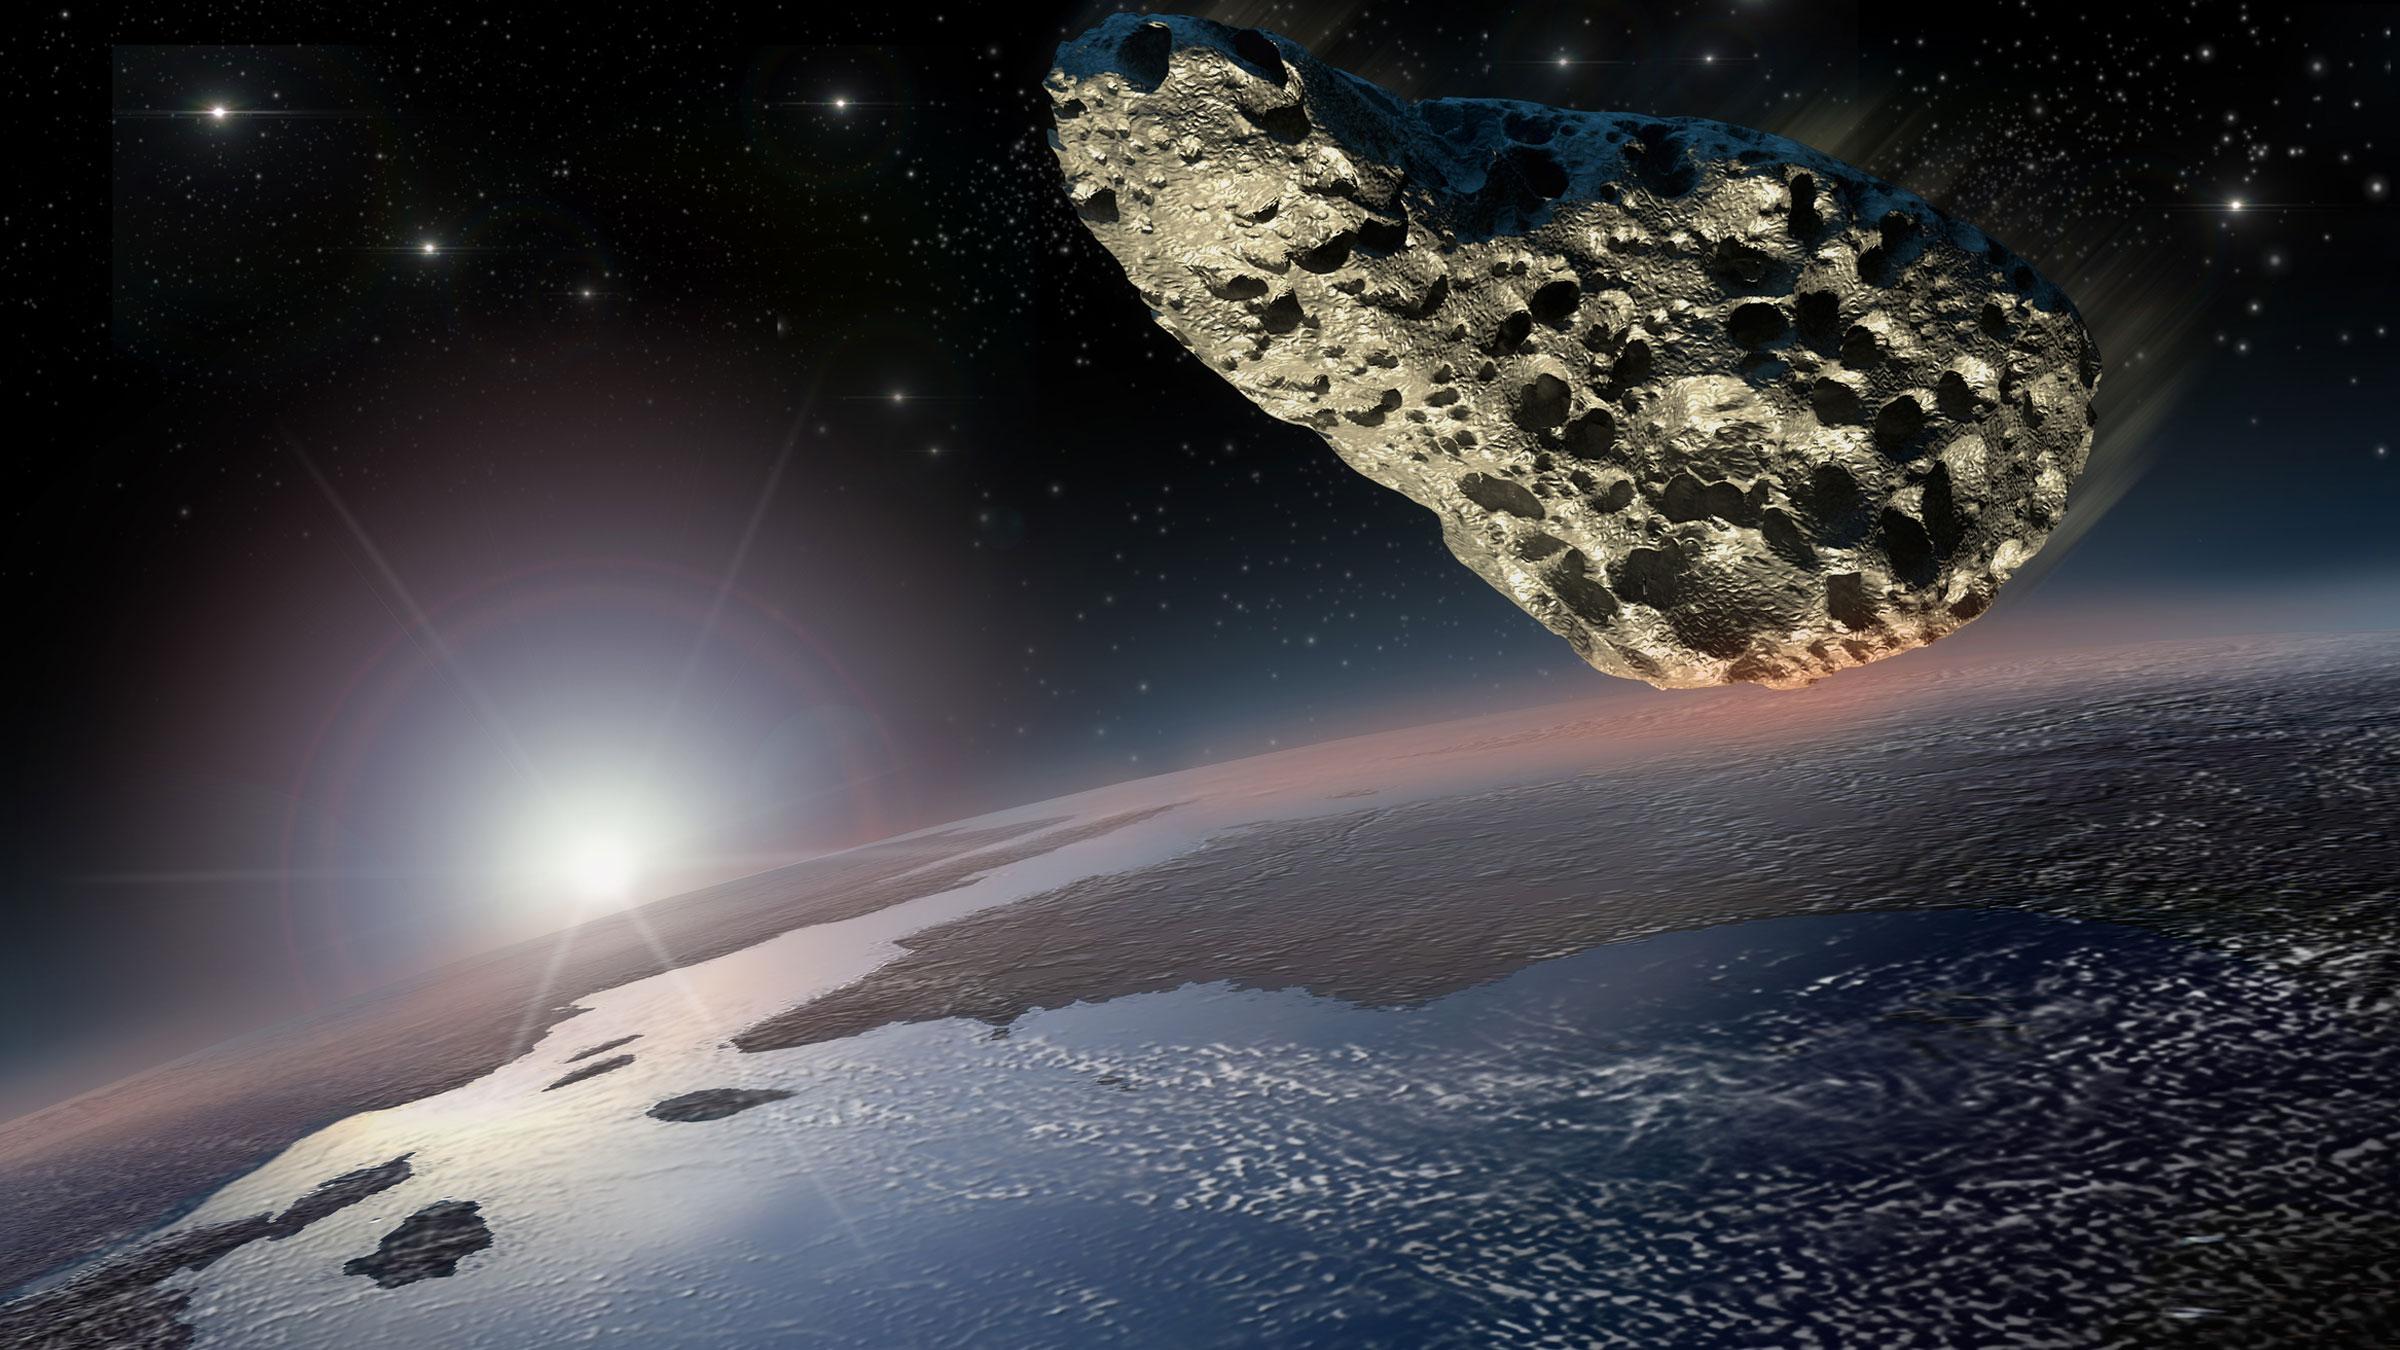 asteroid near earth 2019 - HD1905×1080